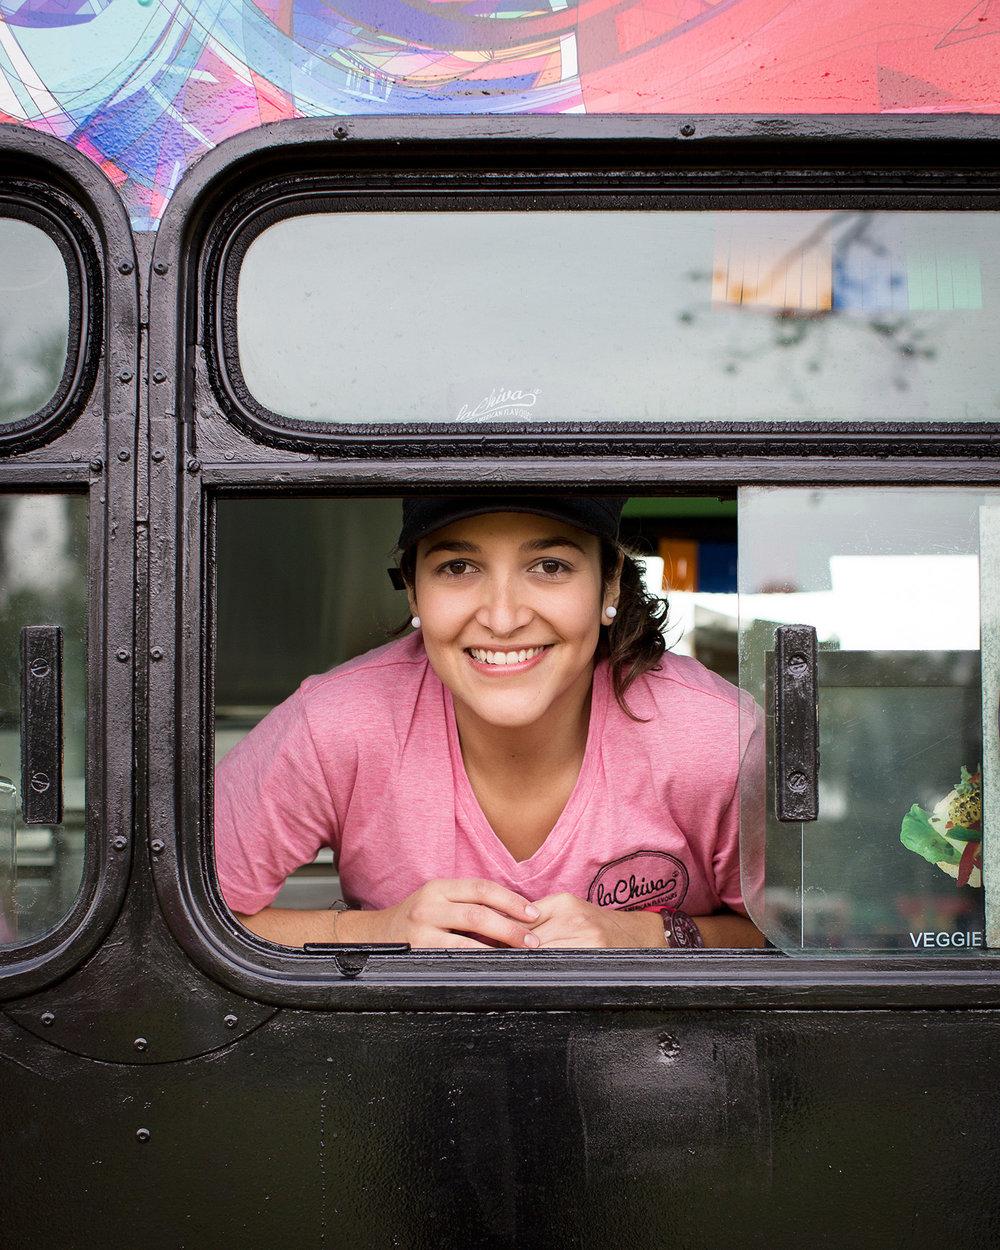 130620_Adelaide_Food_Trucks_365.jpg